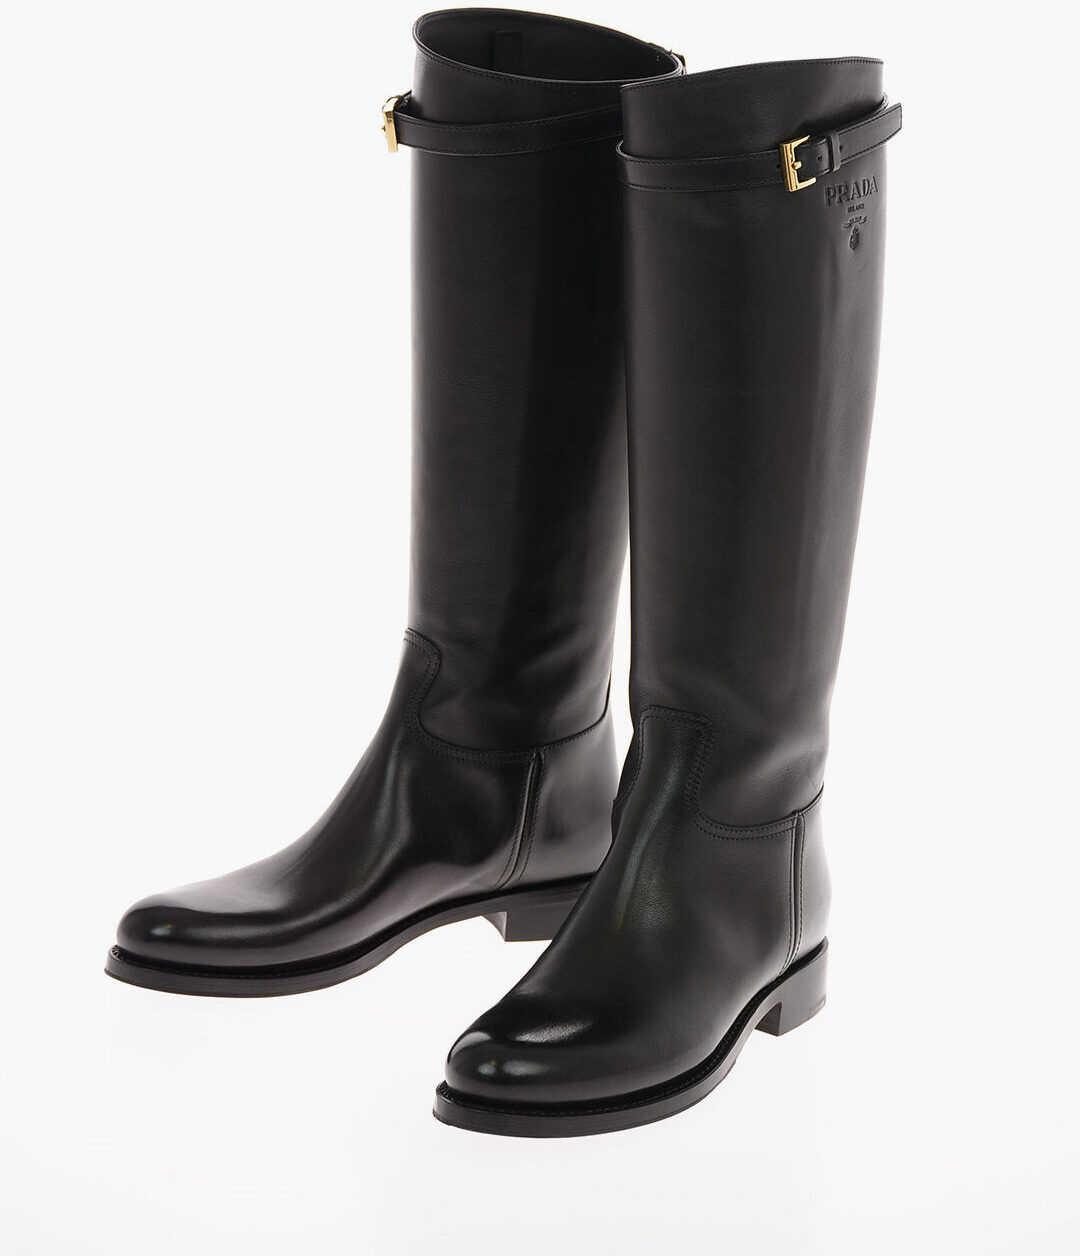 Prada Leather Knee High Boots 5 Cm BLACK imagine b-mall.ro